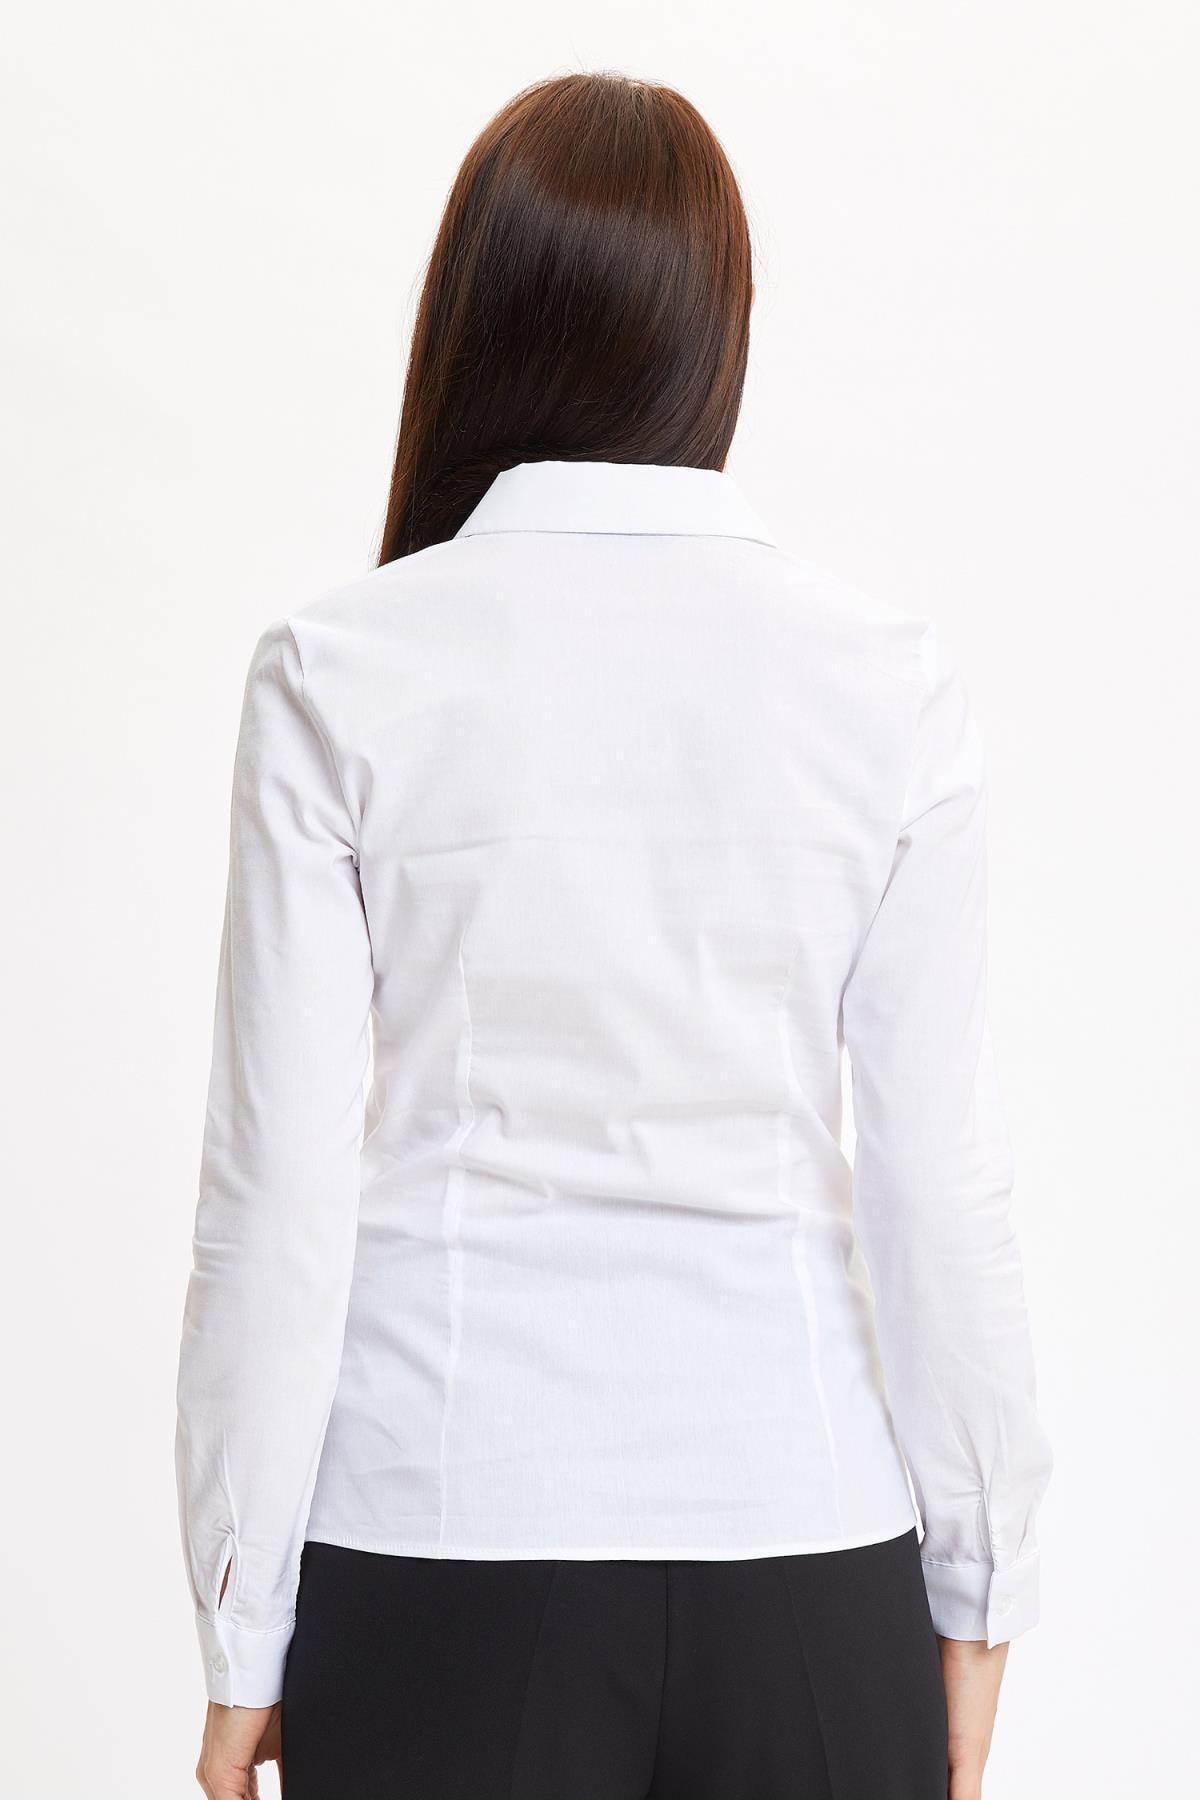 Defacto Basic Uzun Kollu Slim Fit Gömlek 2